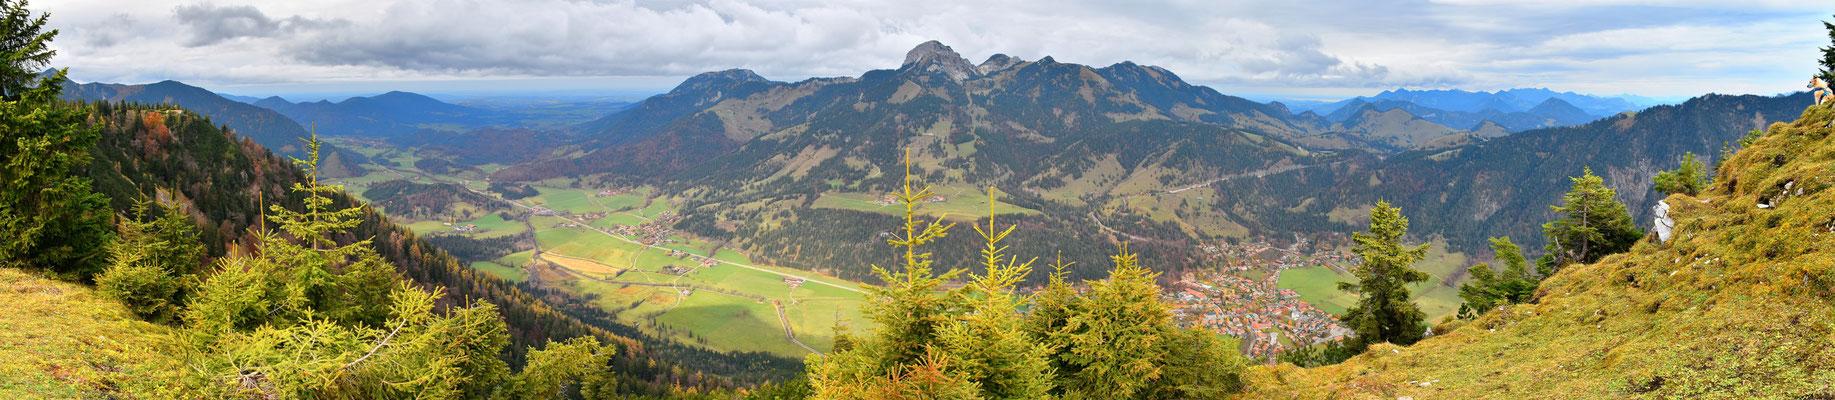 Panorama - Berge - Alpen - Wanderung - Seeberg - Sommer